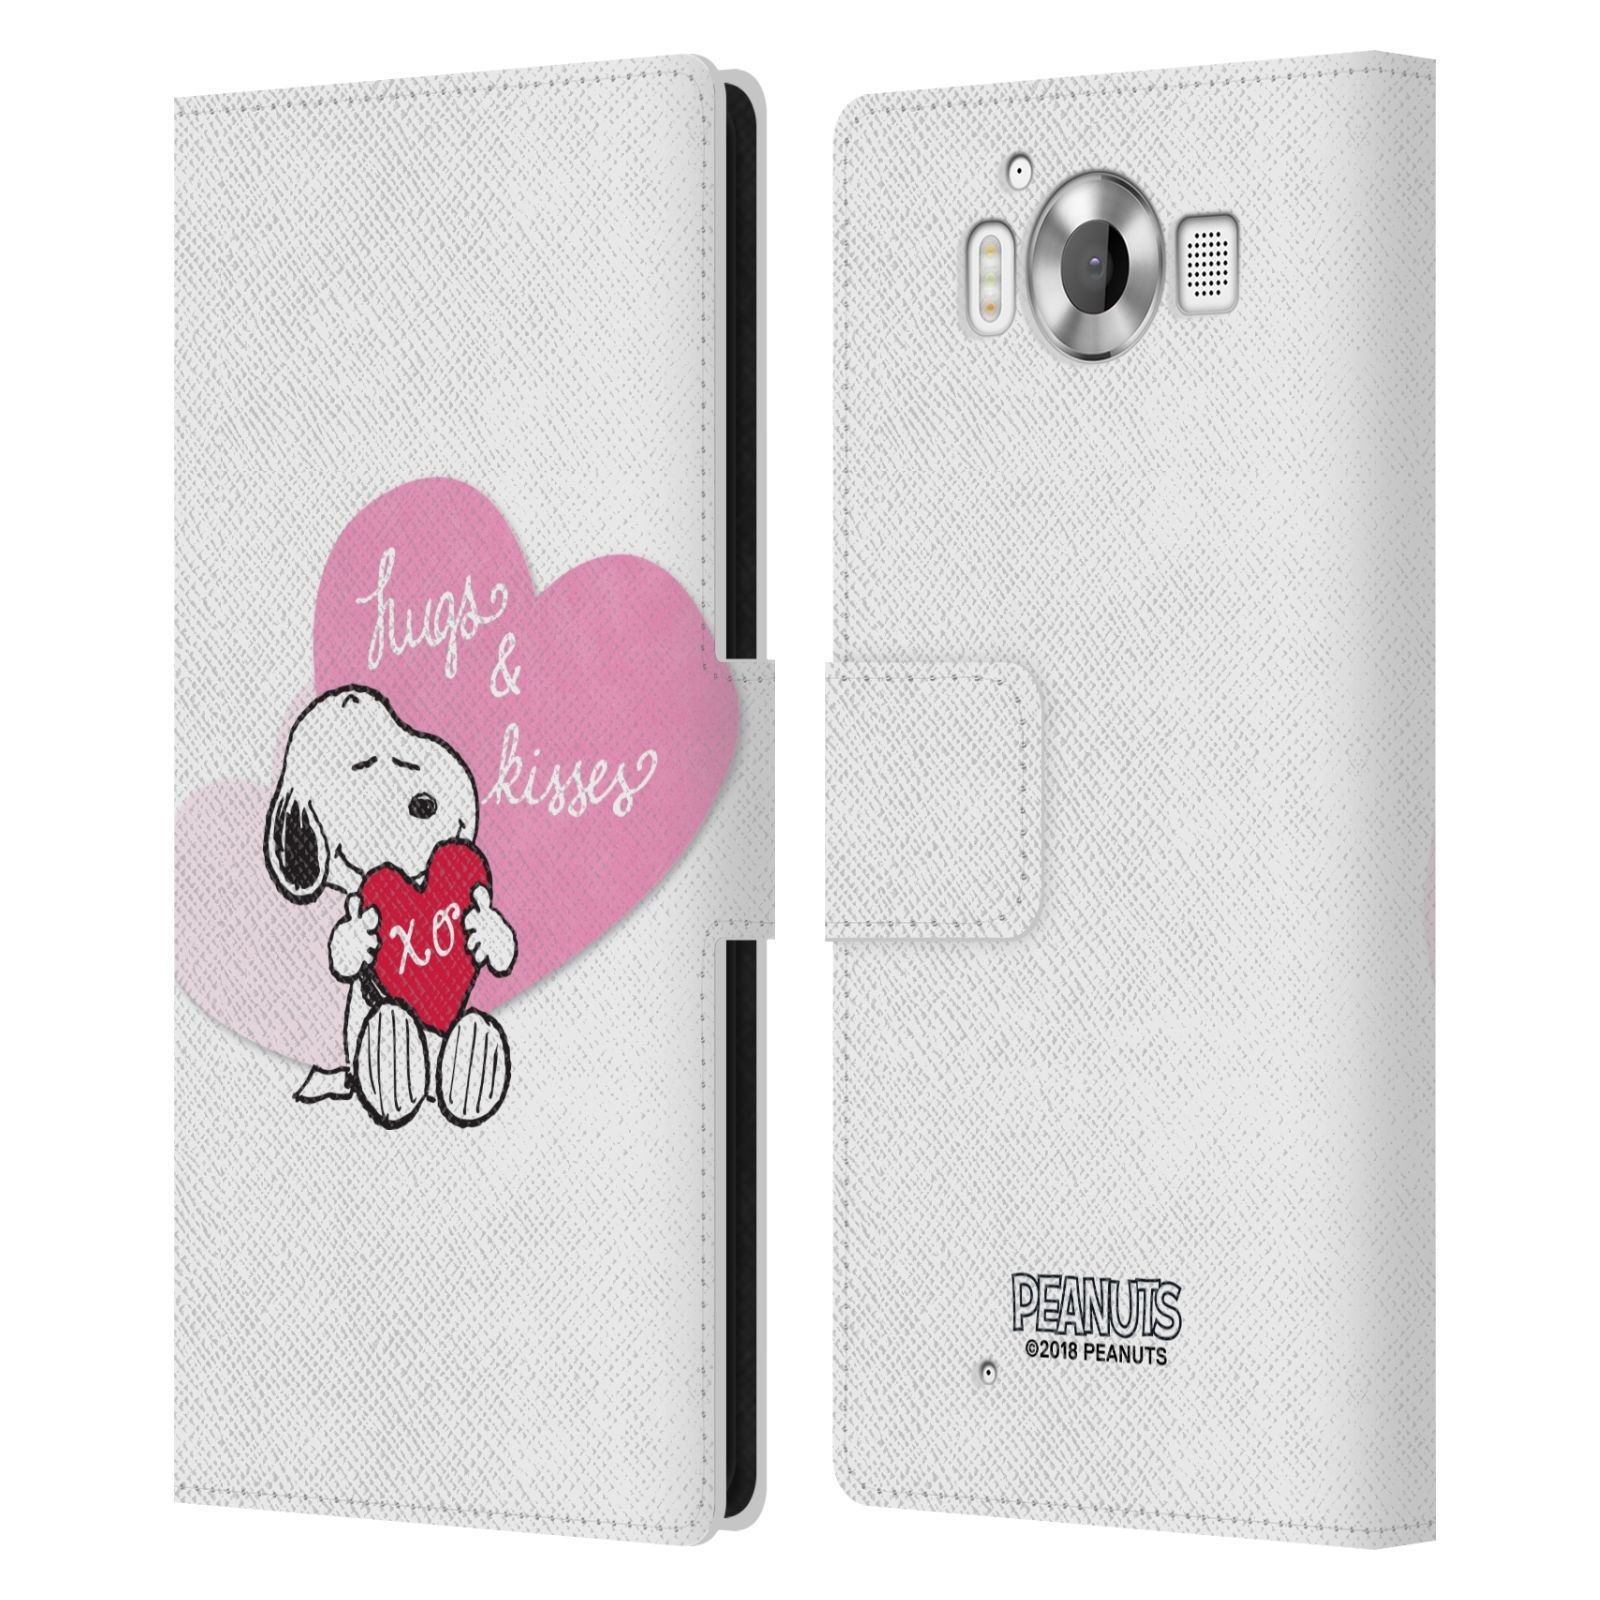 Pouzdro na mobil Nokia Lumia 950 - Head Case - Peanuts - Snoopy pejsek se srdíčkem